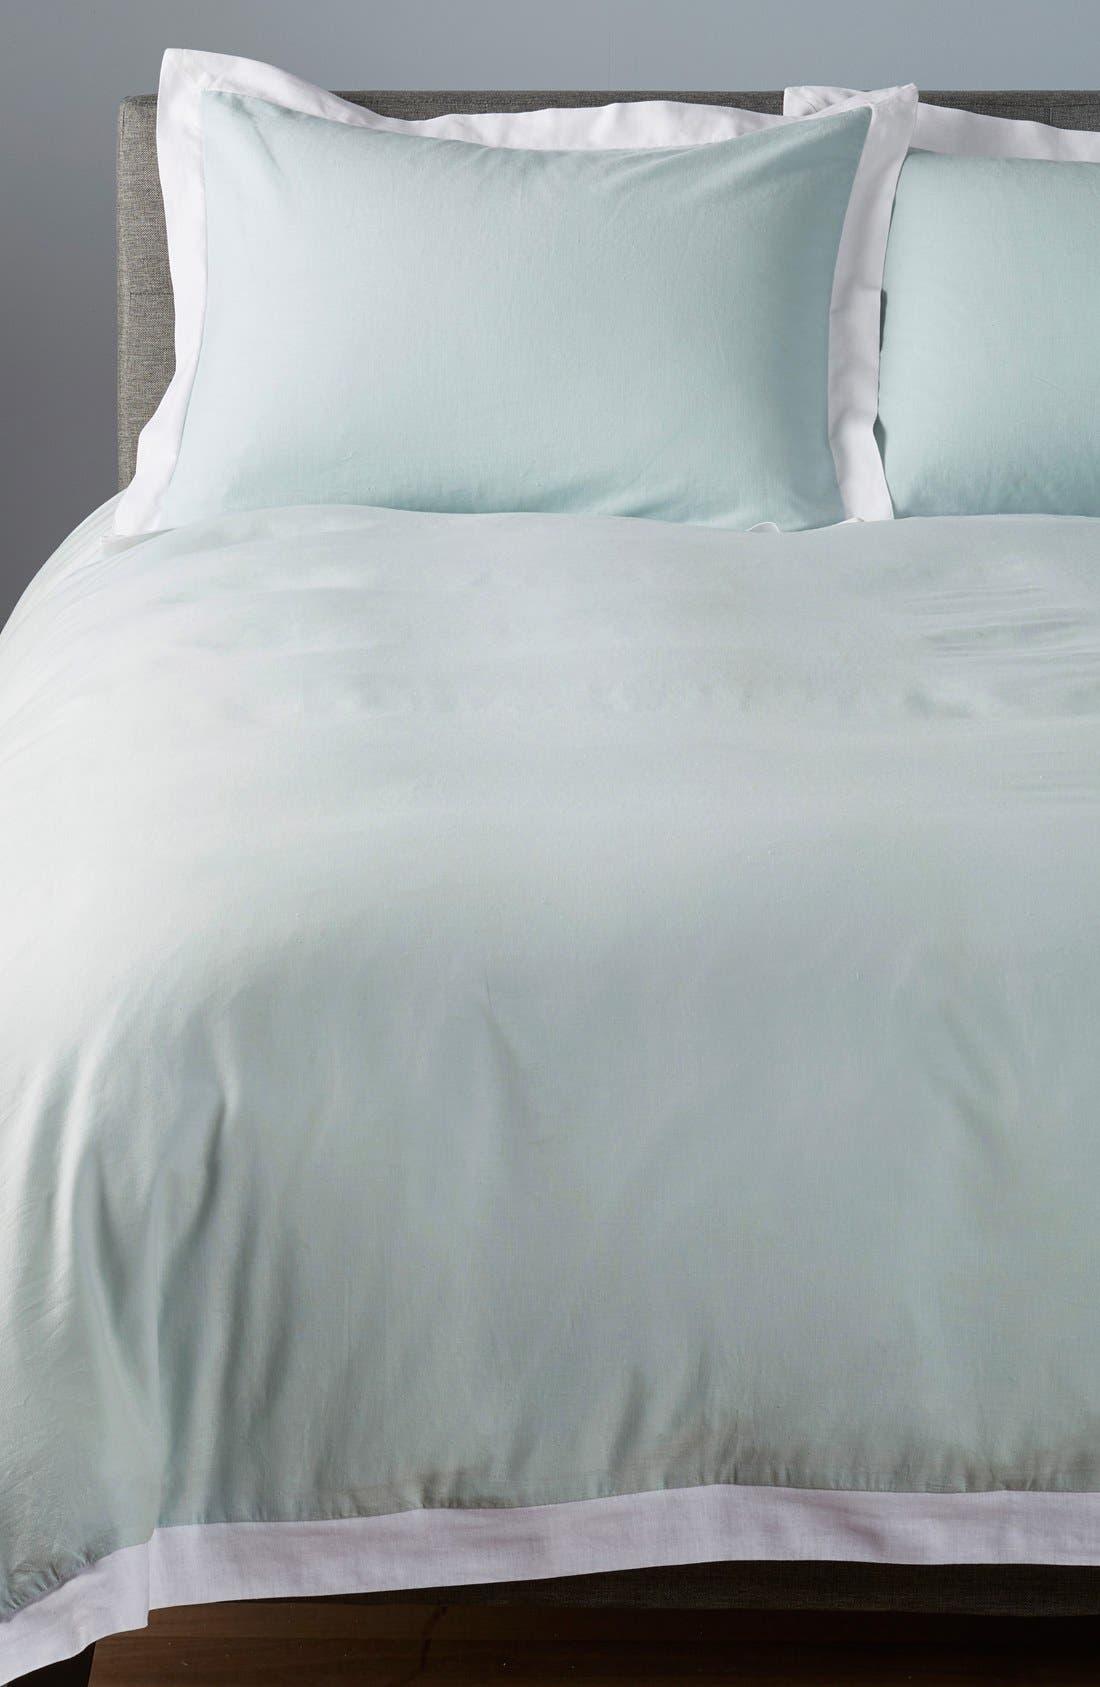 'Spa' Washed Linen Duvet Cover,                         Main,                         color, Blue